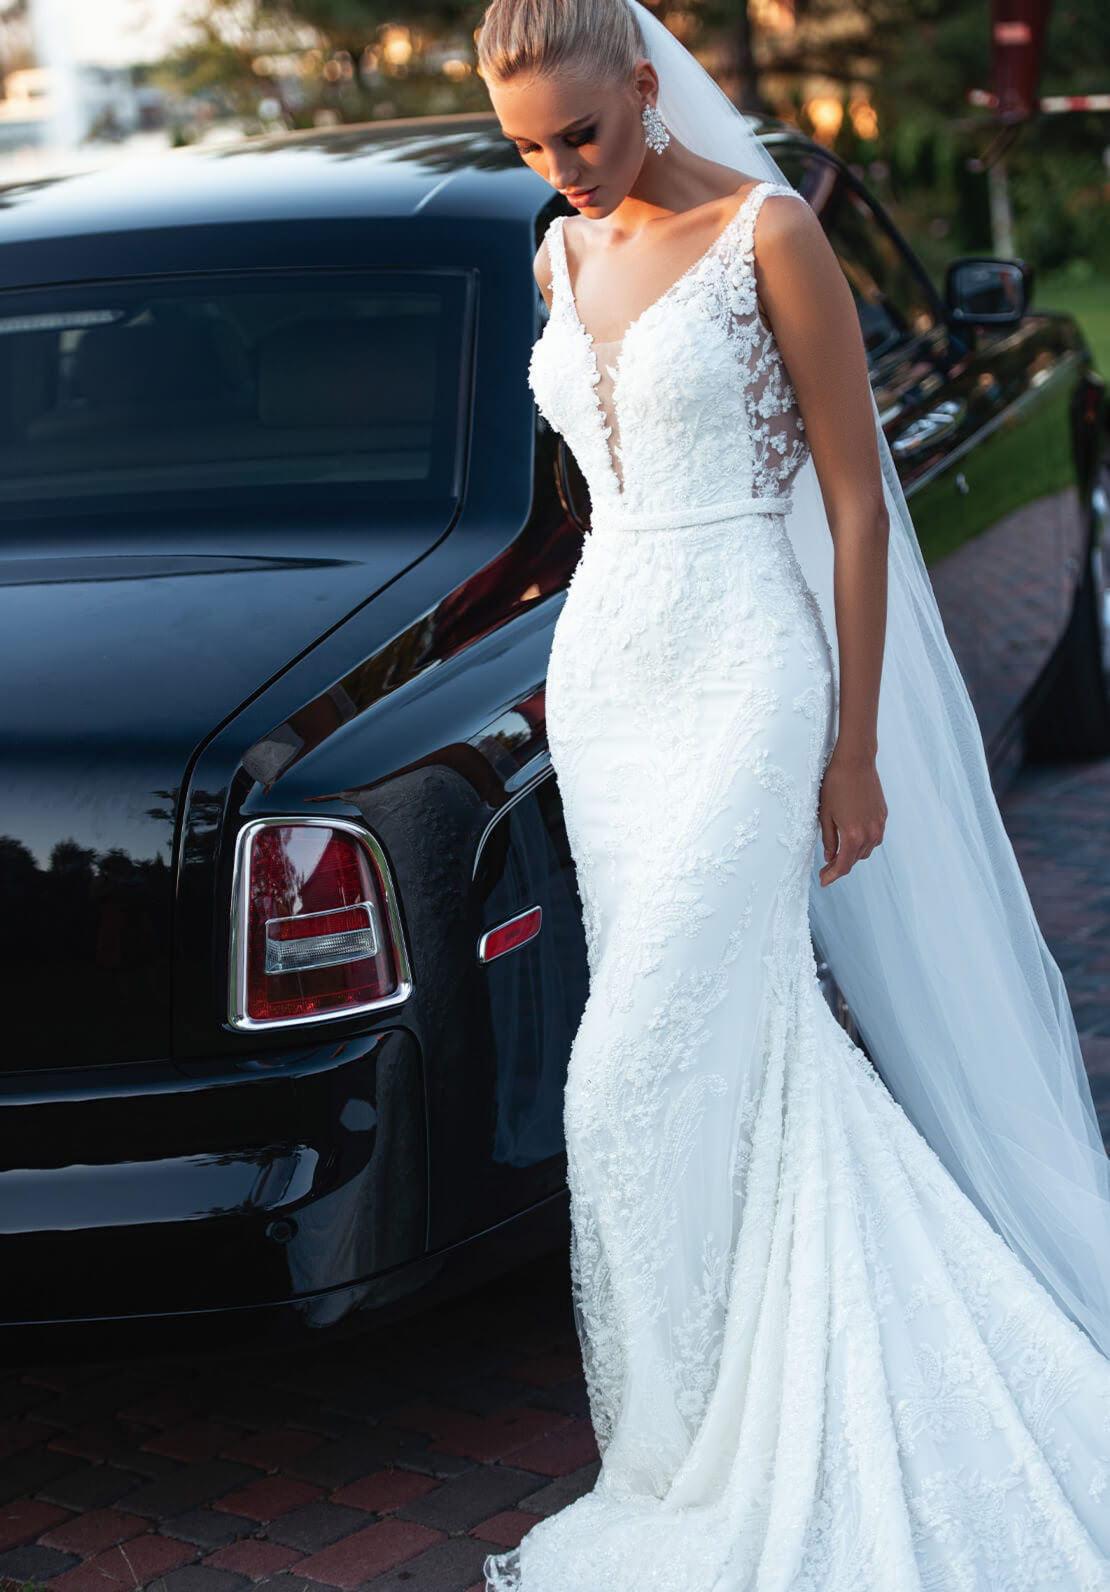 Rolls royce-Phantom-wedding-photoshoot-roycestars-16